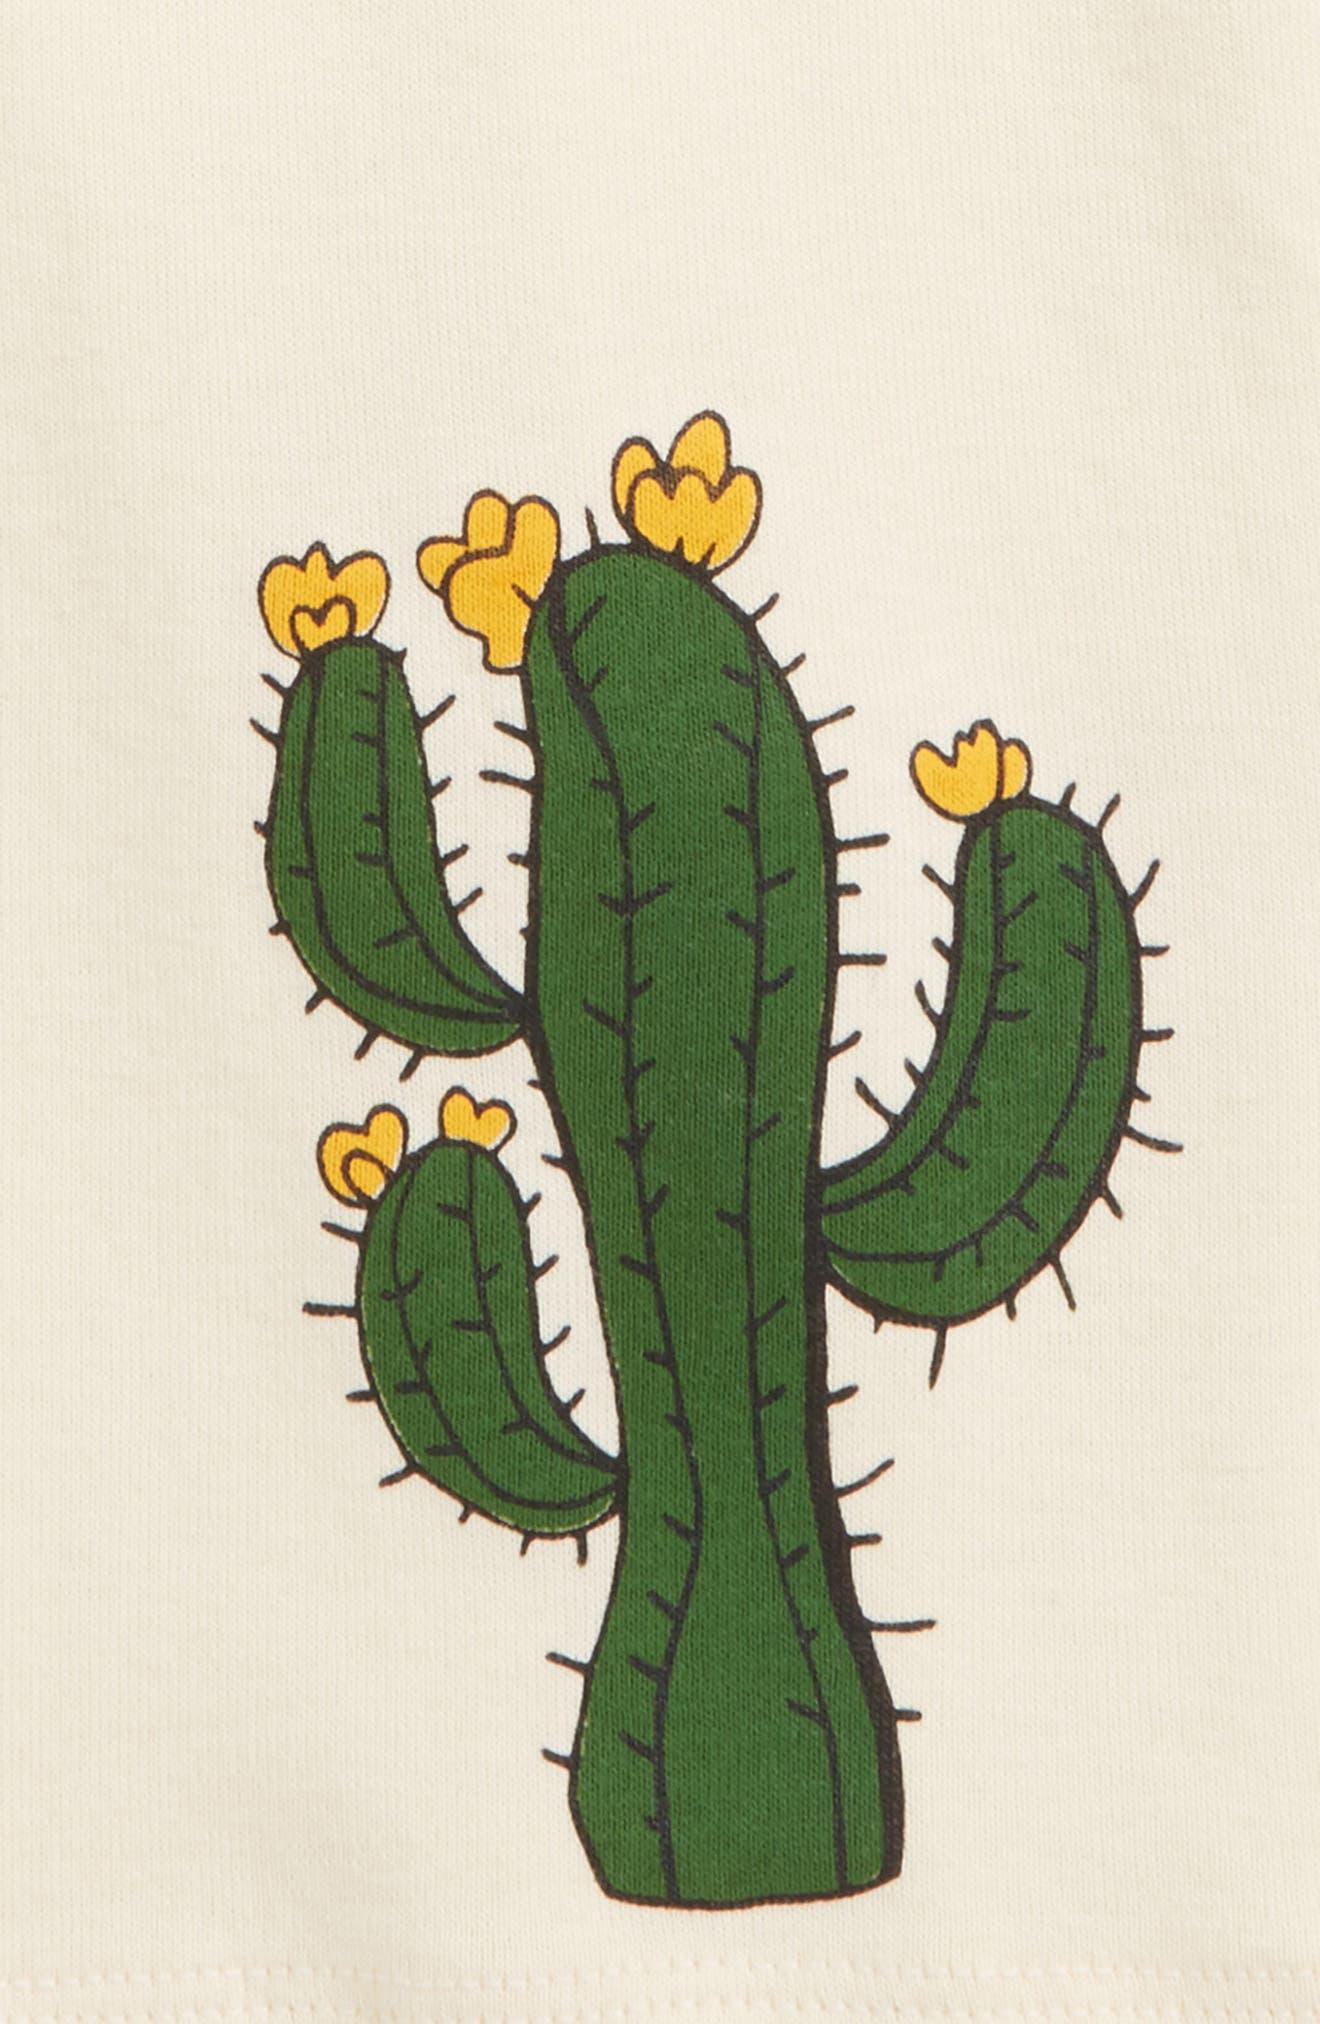 Cactus Organic Cotton Tank,                             Alternate thumbnail 2, color,                             Off White